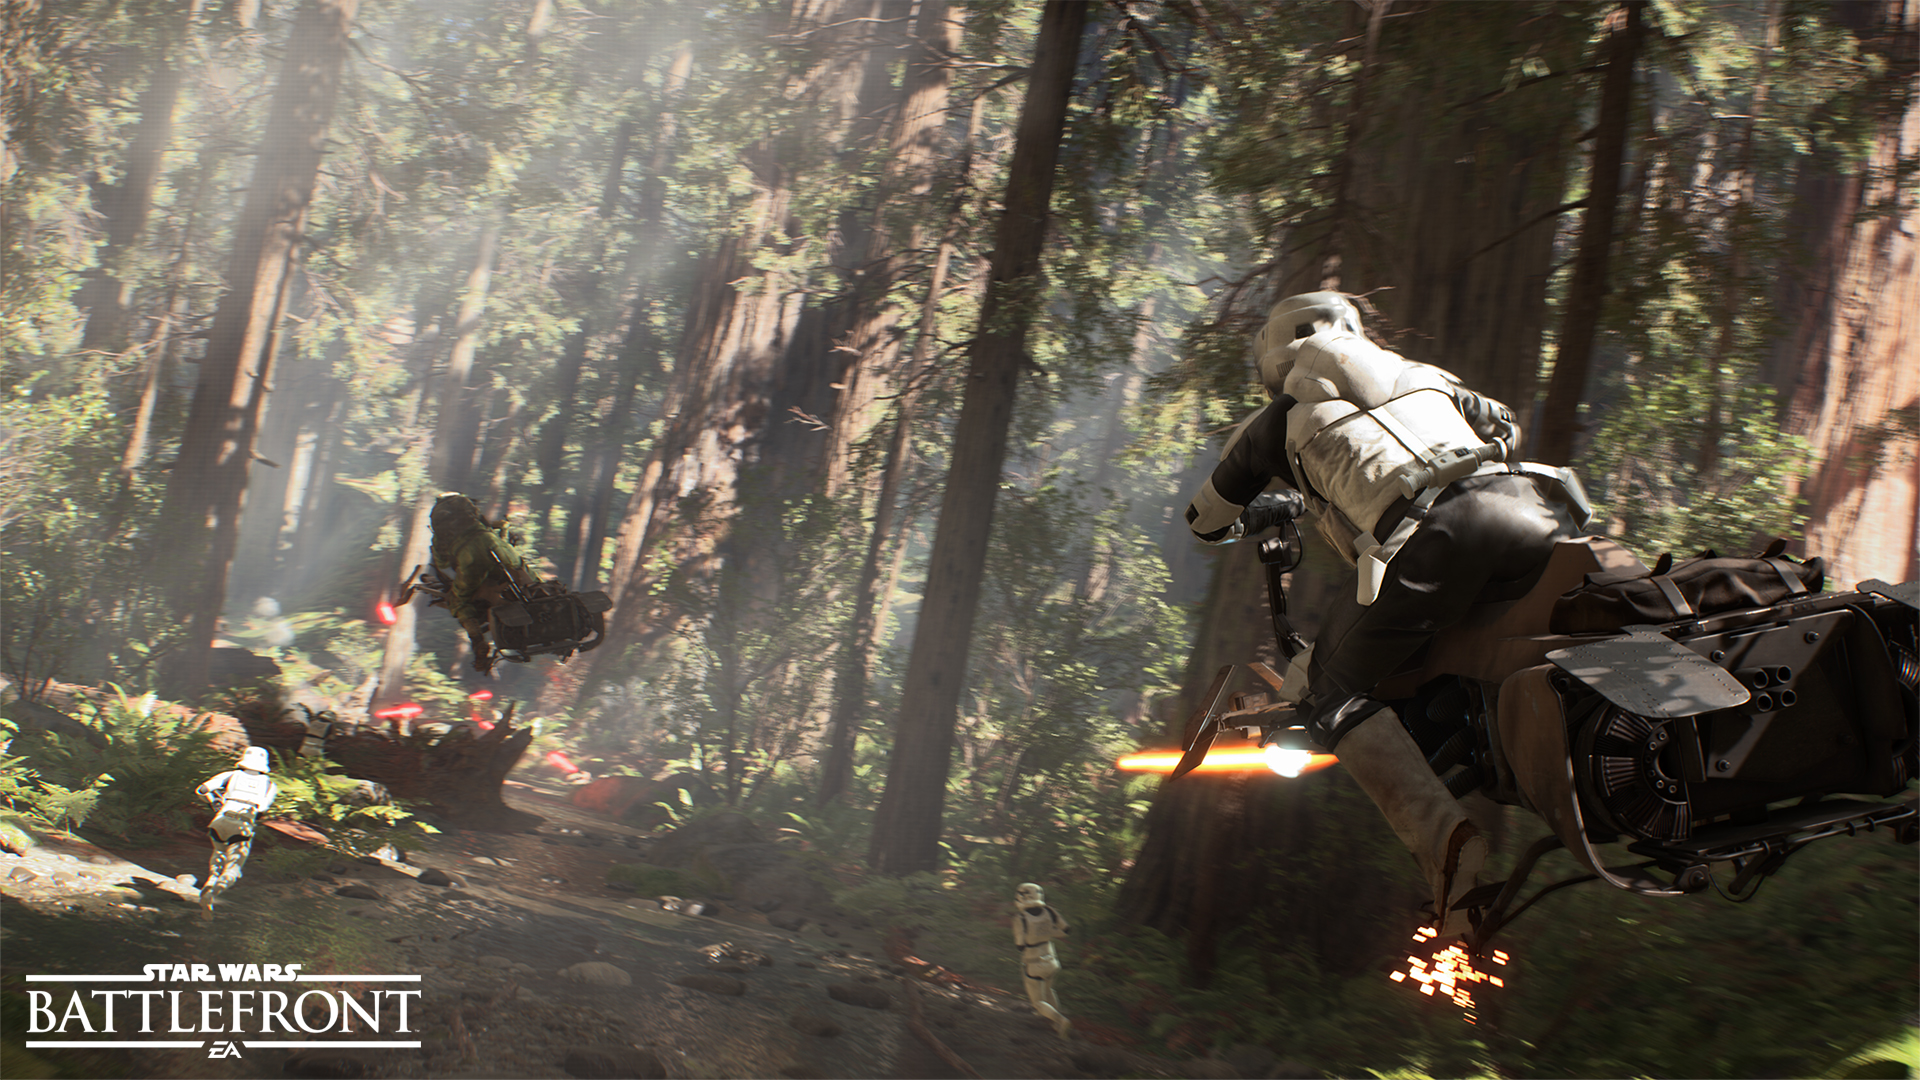 Star Wars Battlefront Gets New Info Number of Maps Frame Rate 1920x1080